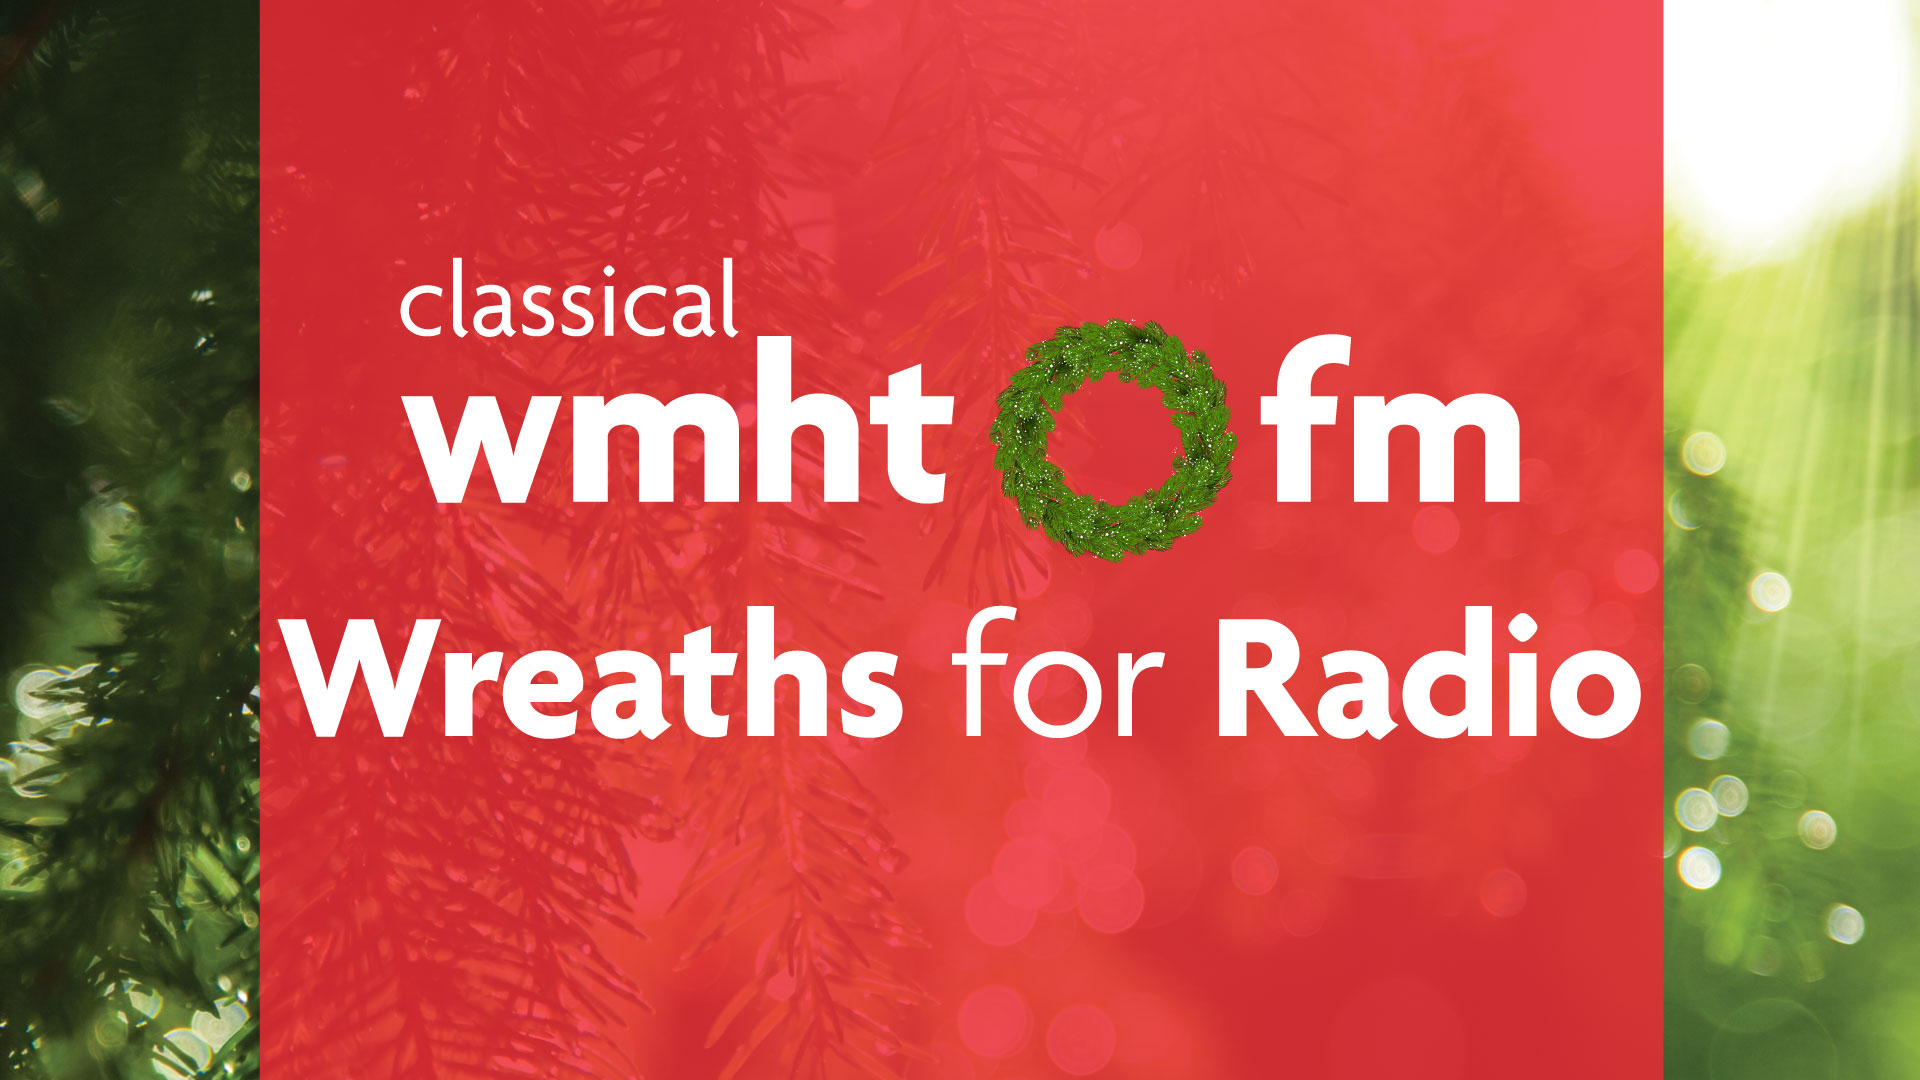 Wreaths for Radio